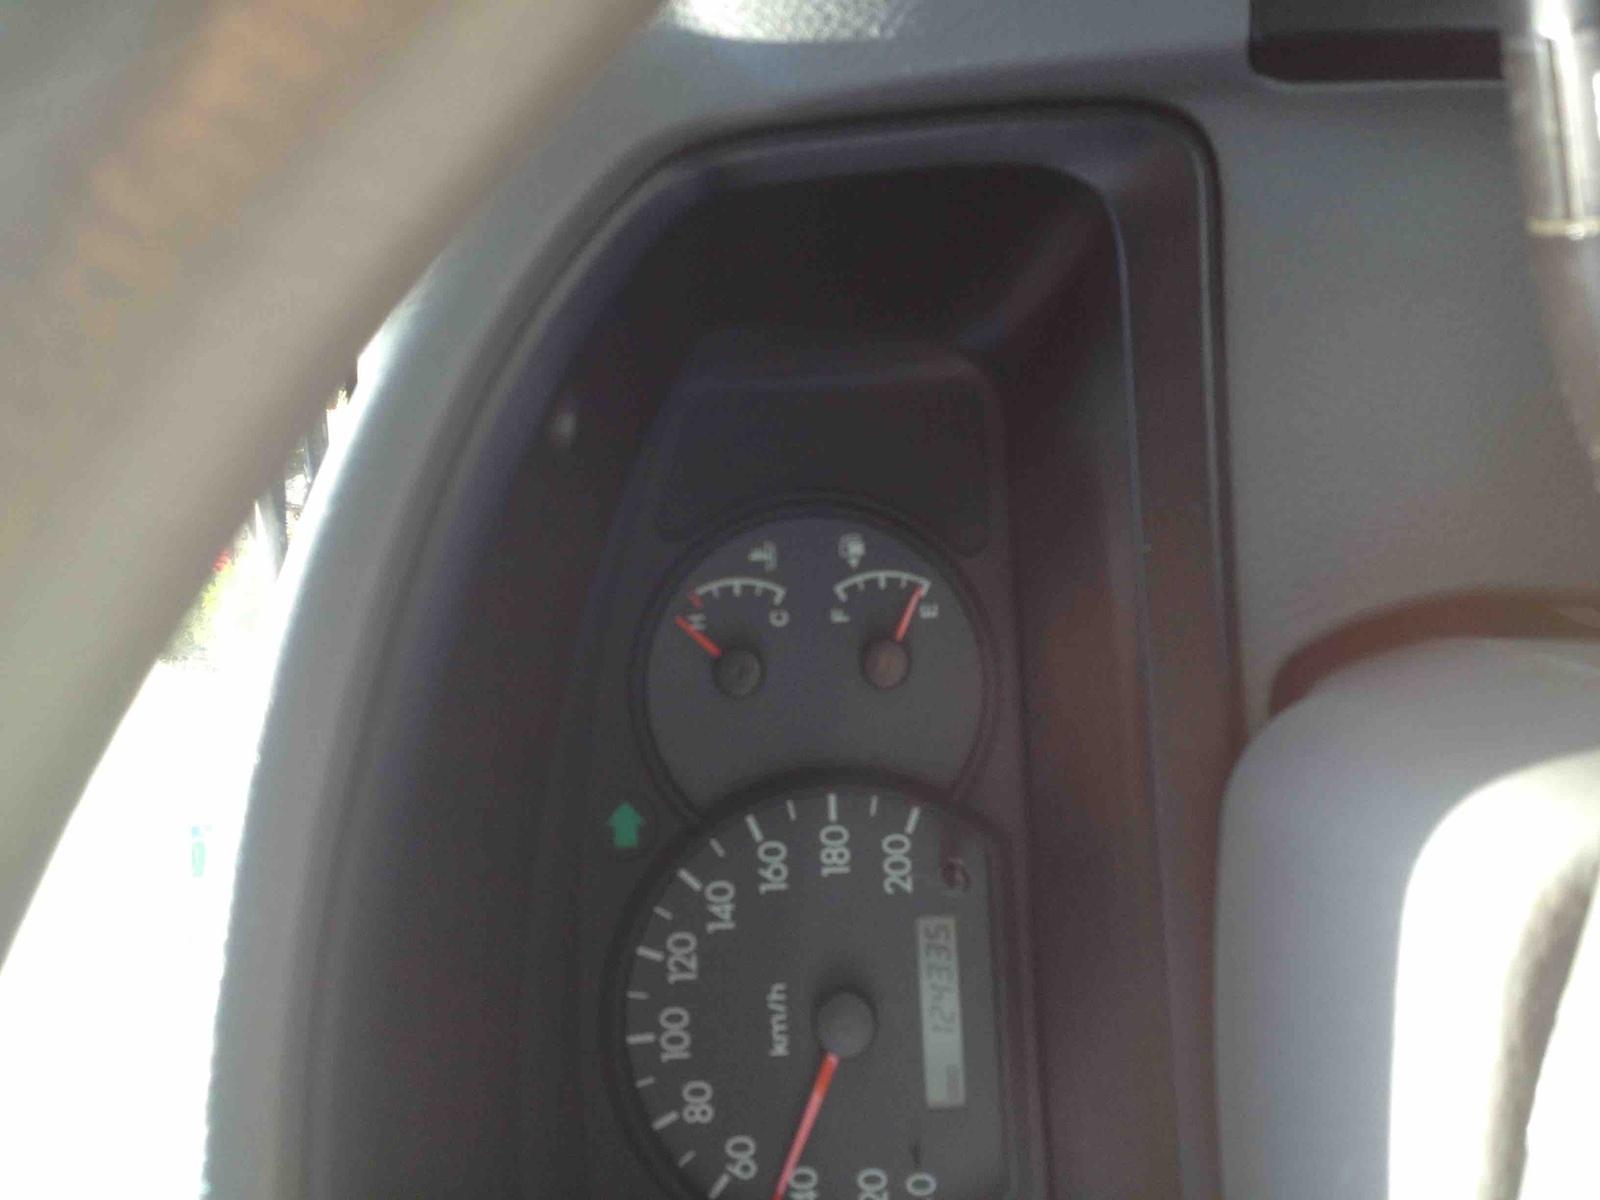 Kia Rio Questions 2003 15 L Sedan Over Heating Cargurus Radiator Coolant Hose Connector